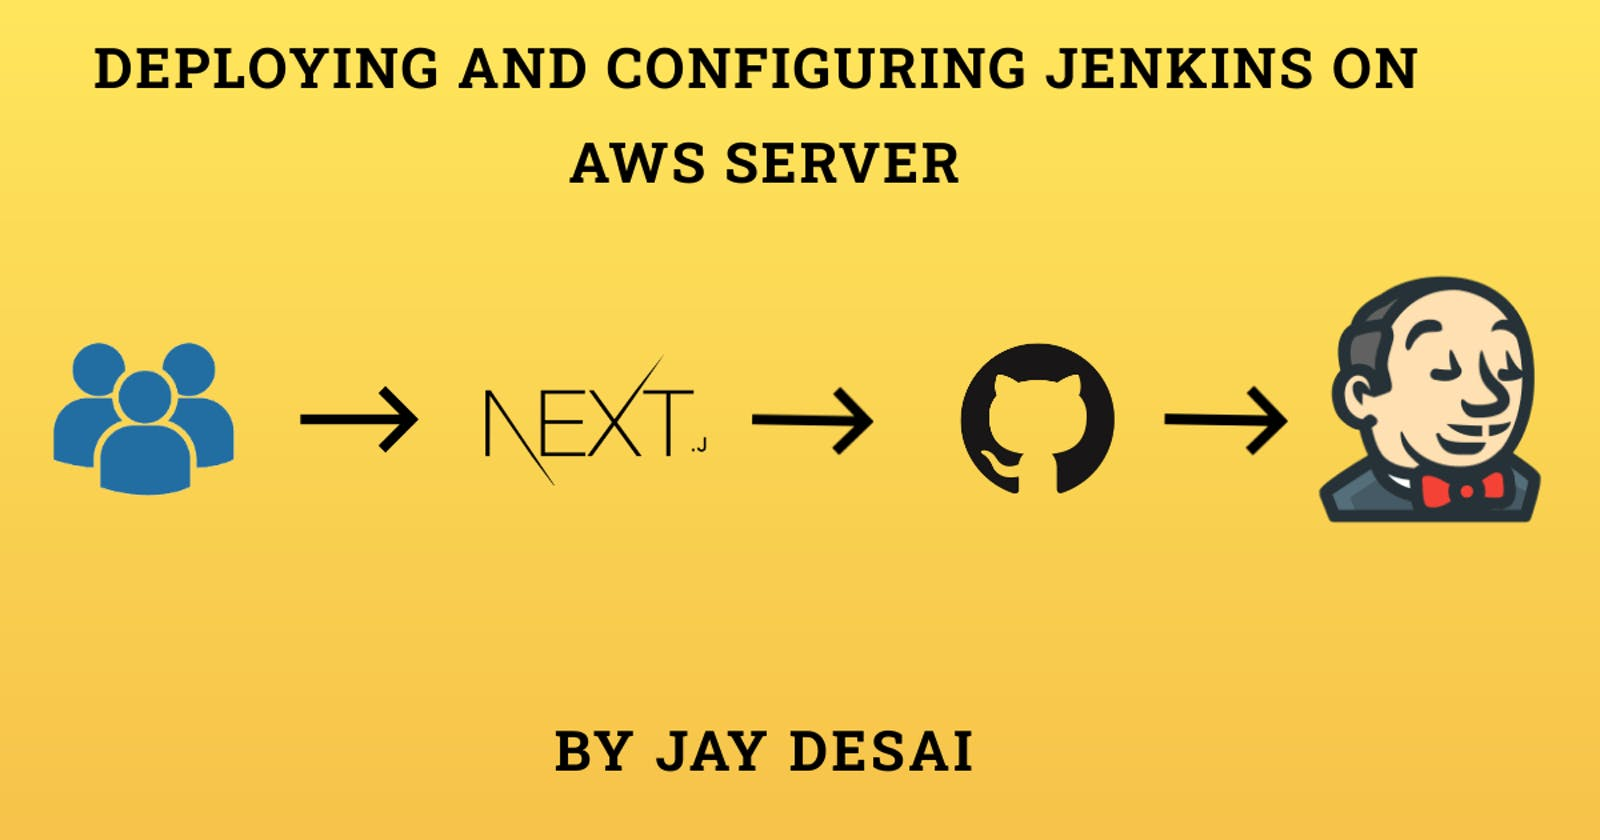 DevOps 101 - Deploying & Configuring Jenkins on AWS server